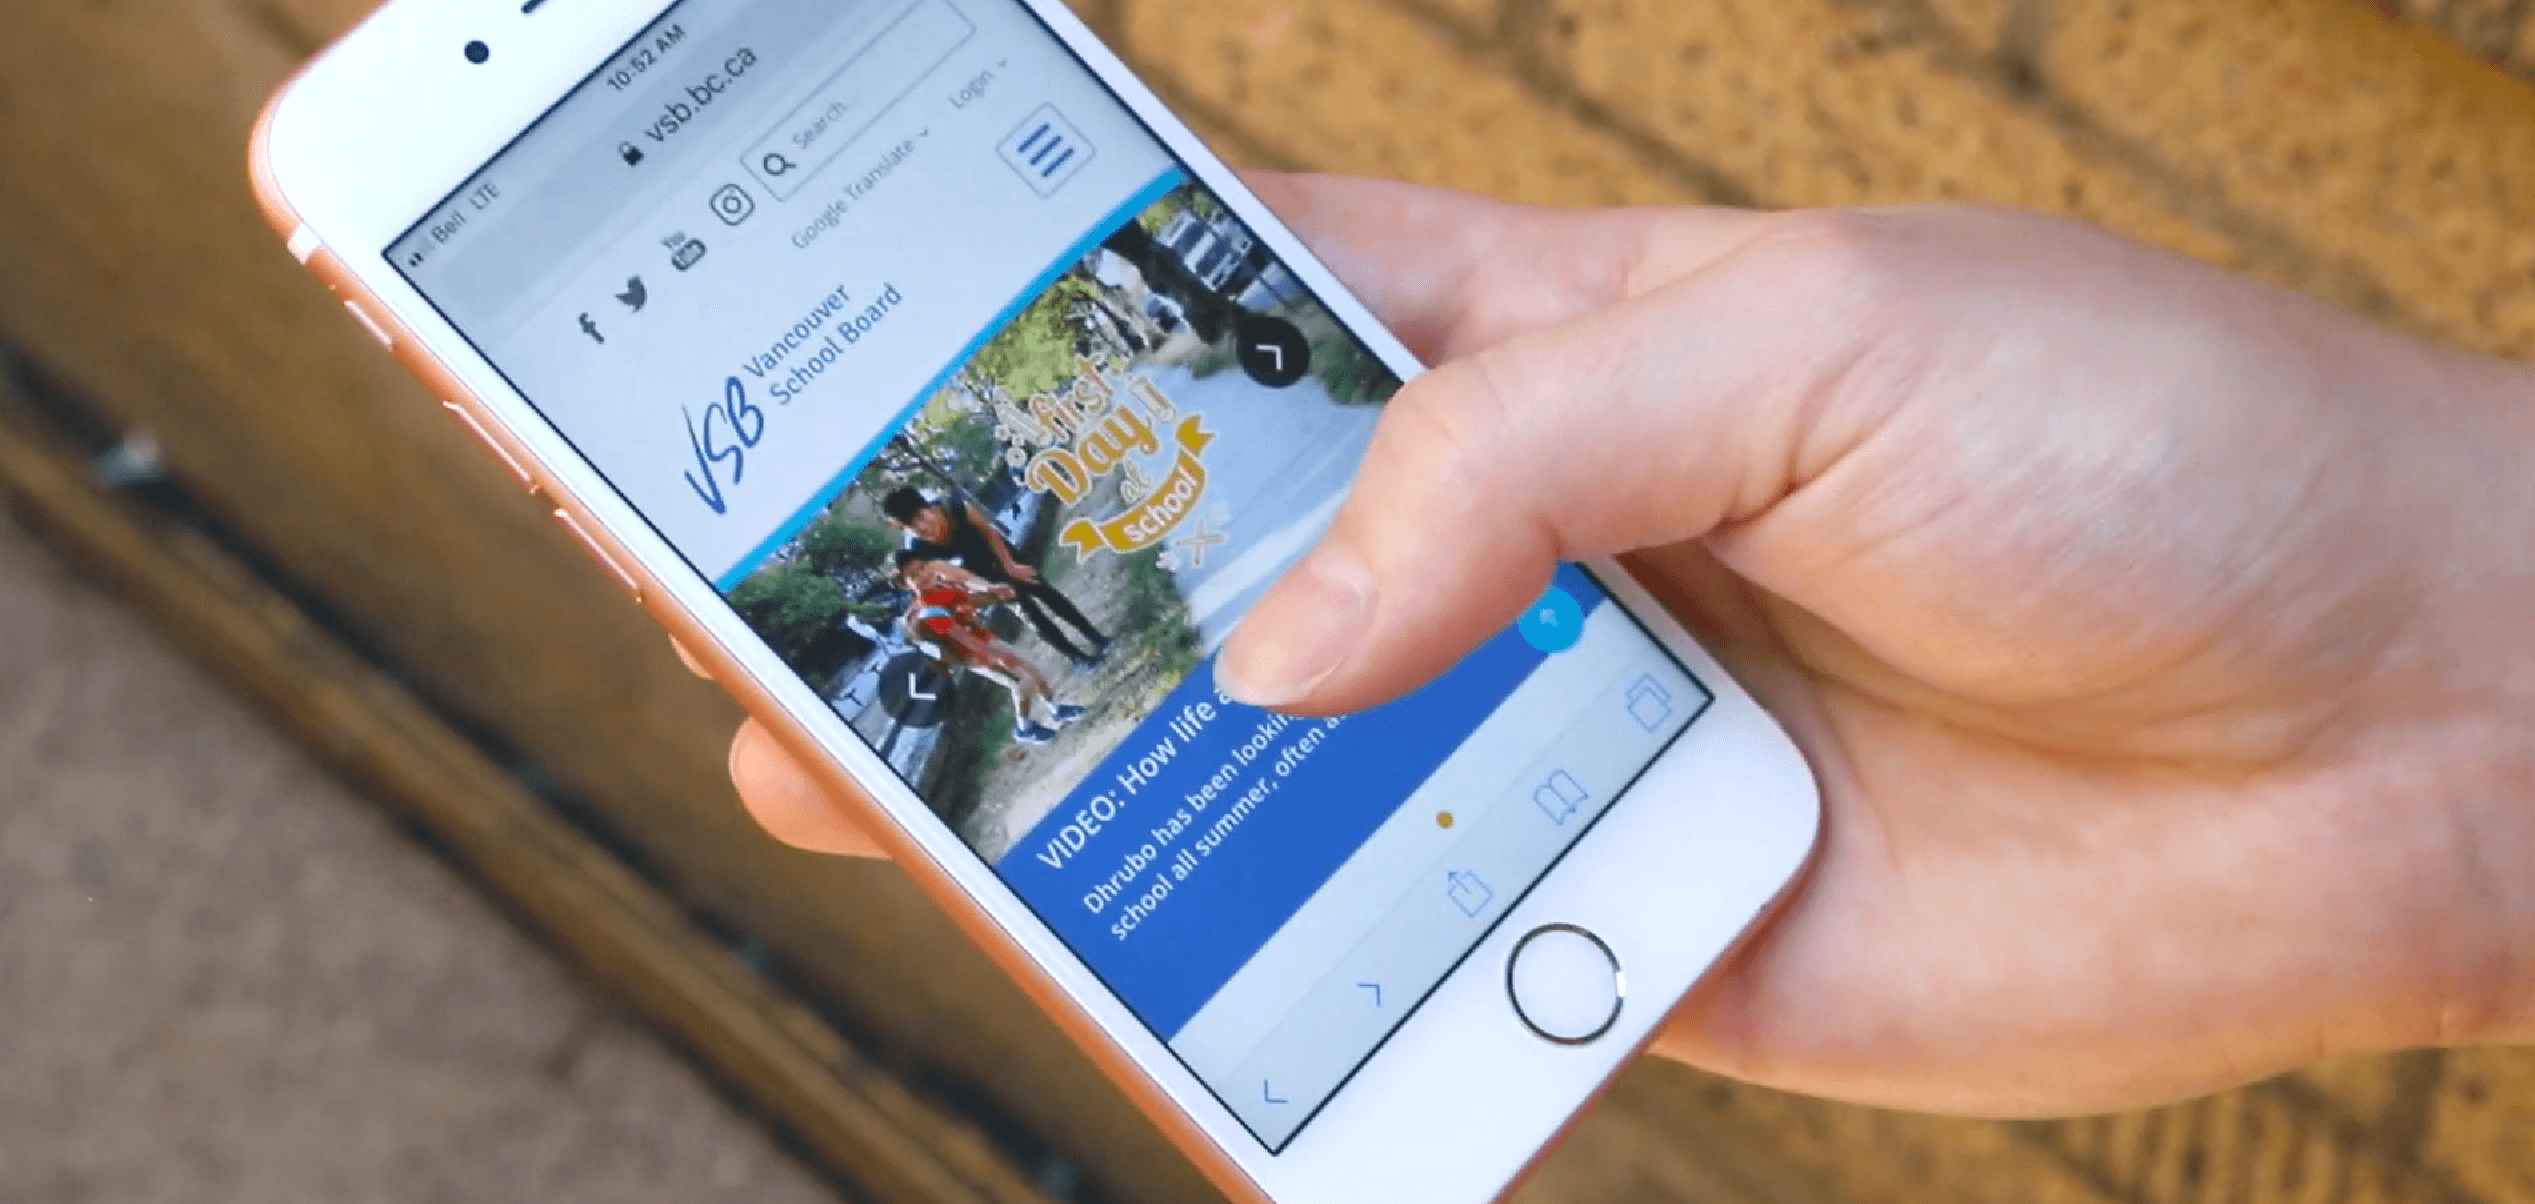 VSB News on mobile device